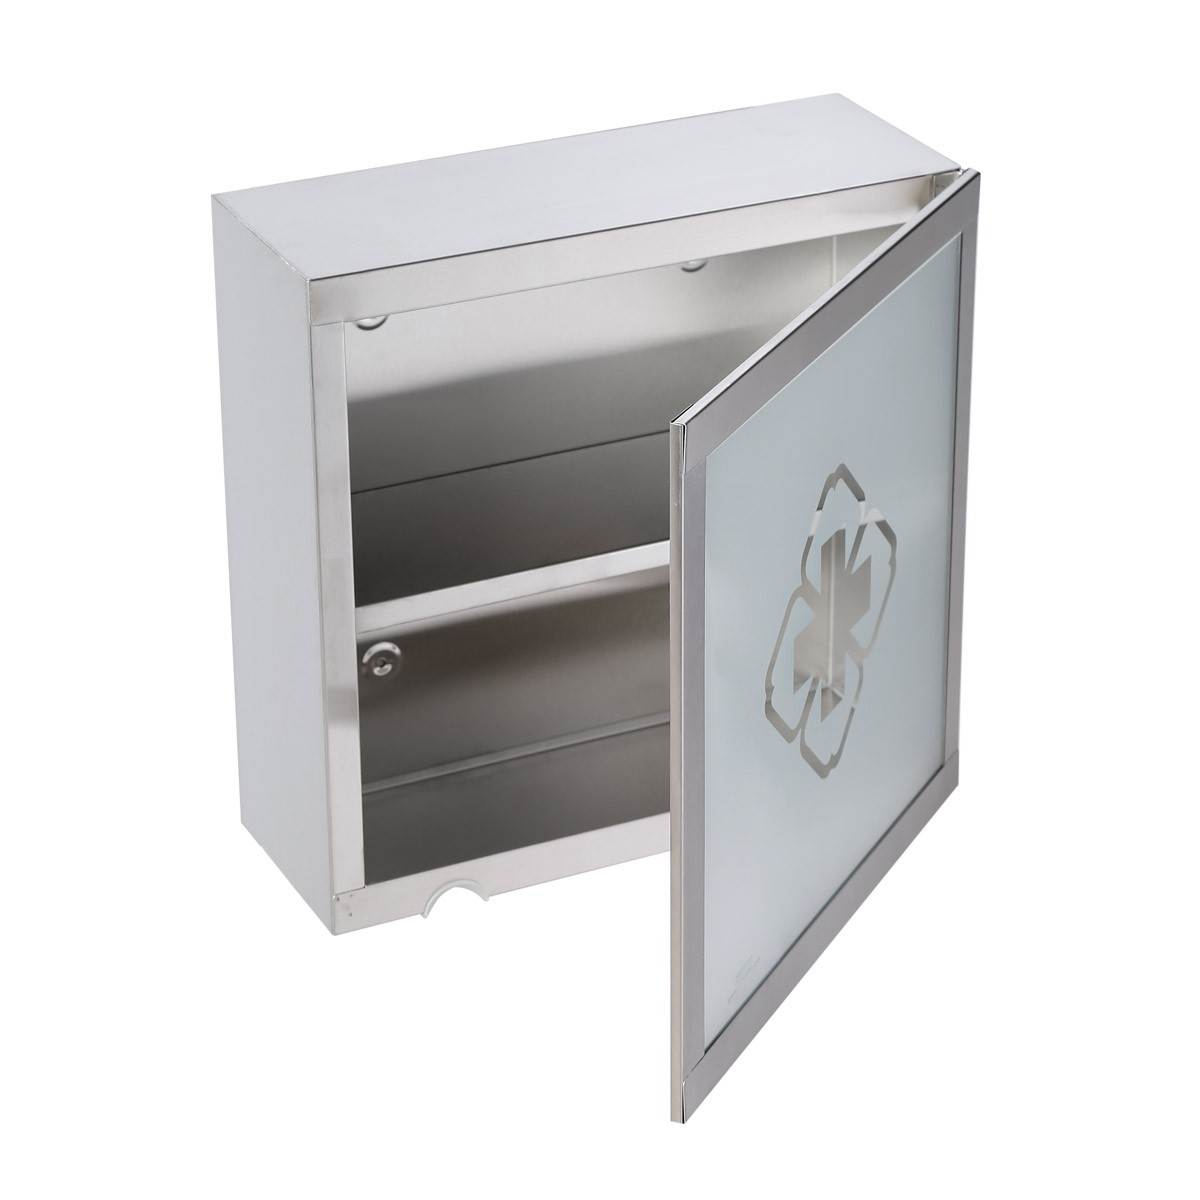 Mini Stainless Steel Bathroom Medicine Cabinet Wall Mount Storage Medicine Cabinet Organizer Medicine Cabinet Shelf Wall Mount Medicine Cabinet